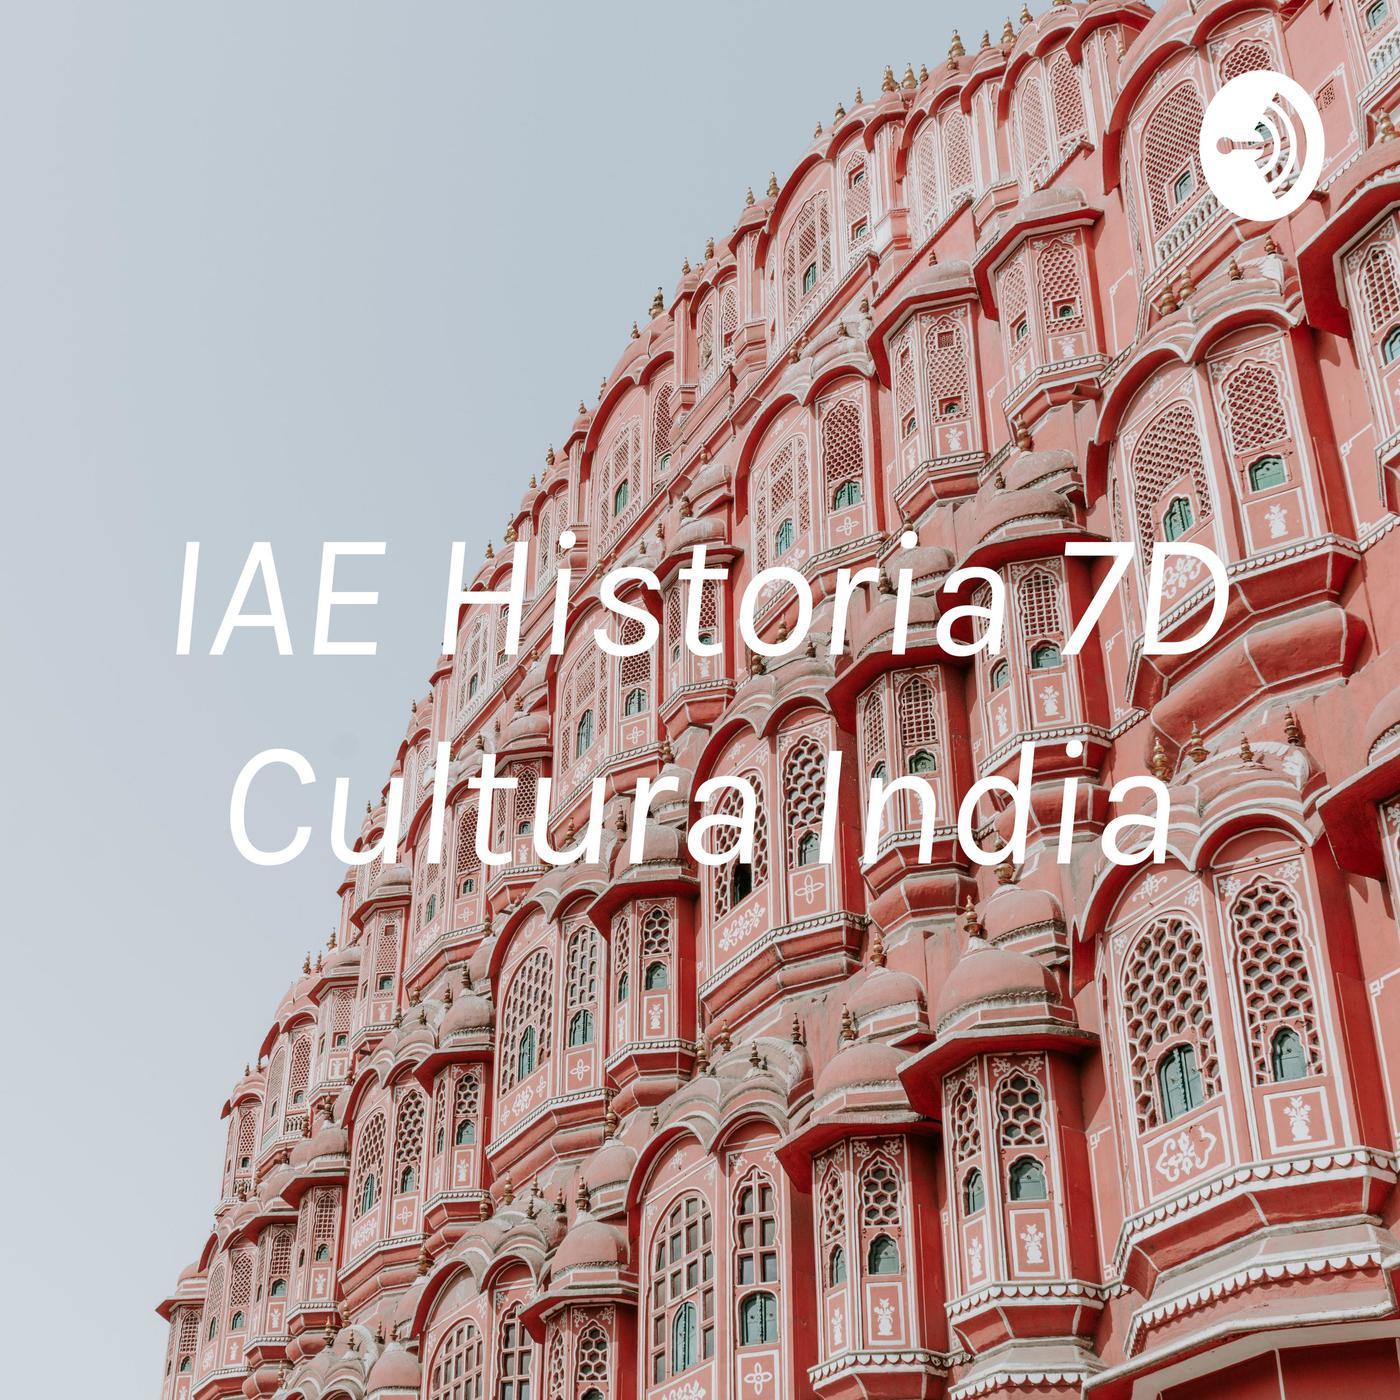 Iae Historia 7d Cultura India Podcast Fernanda Valentina Zepeda Toro Listen Notes